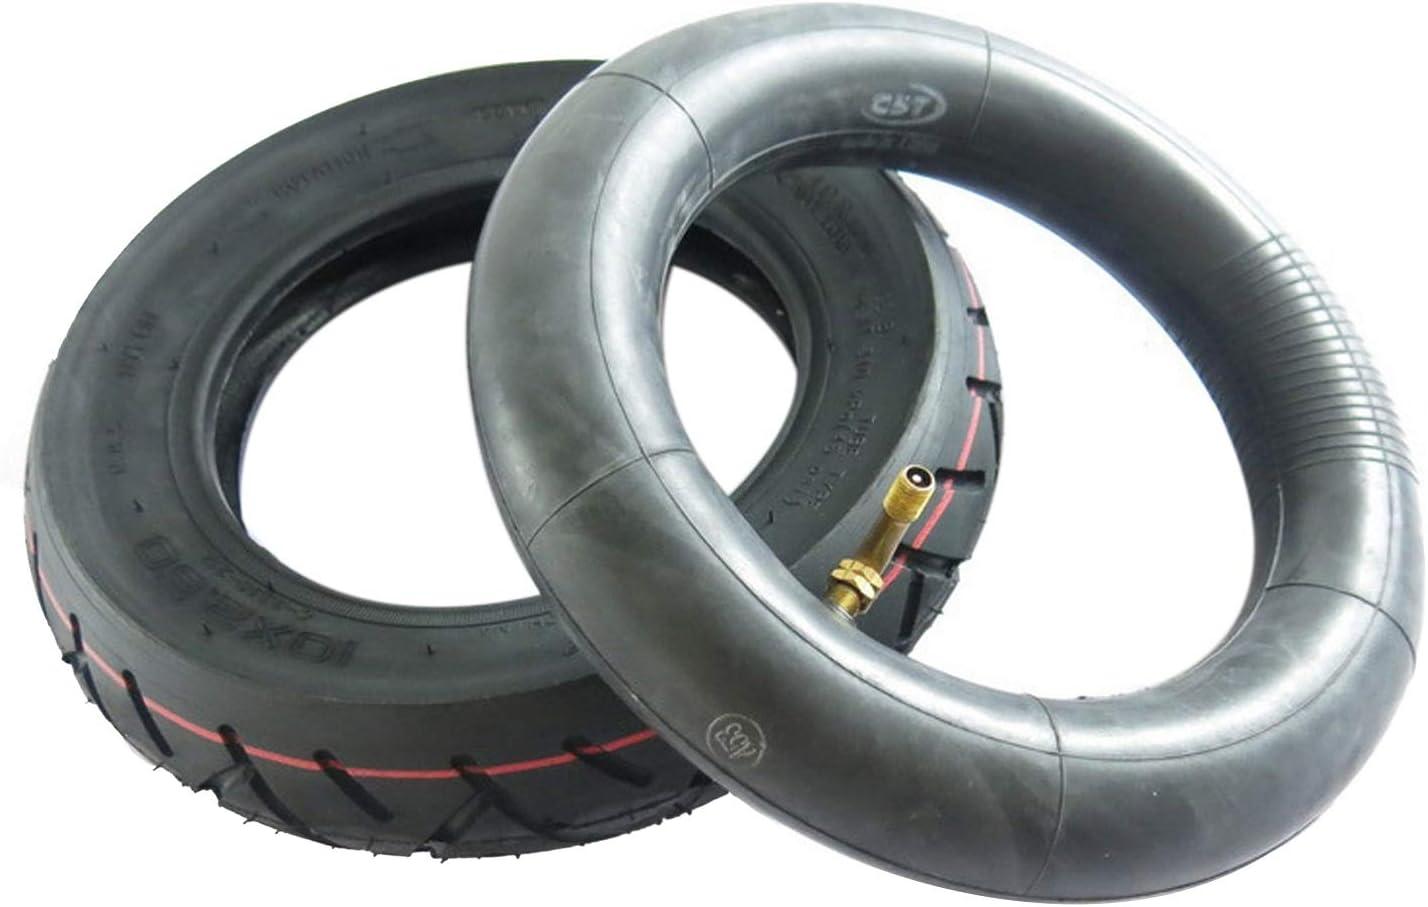 D5+2.0 NANROBOT Electric Scooter Tire